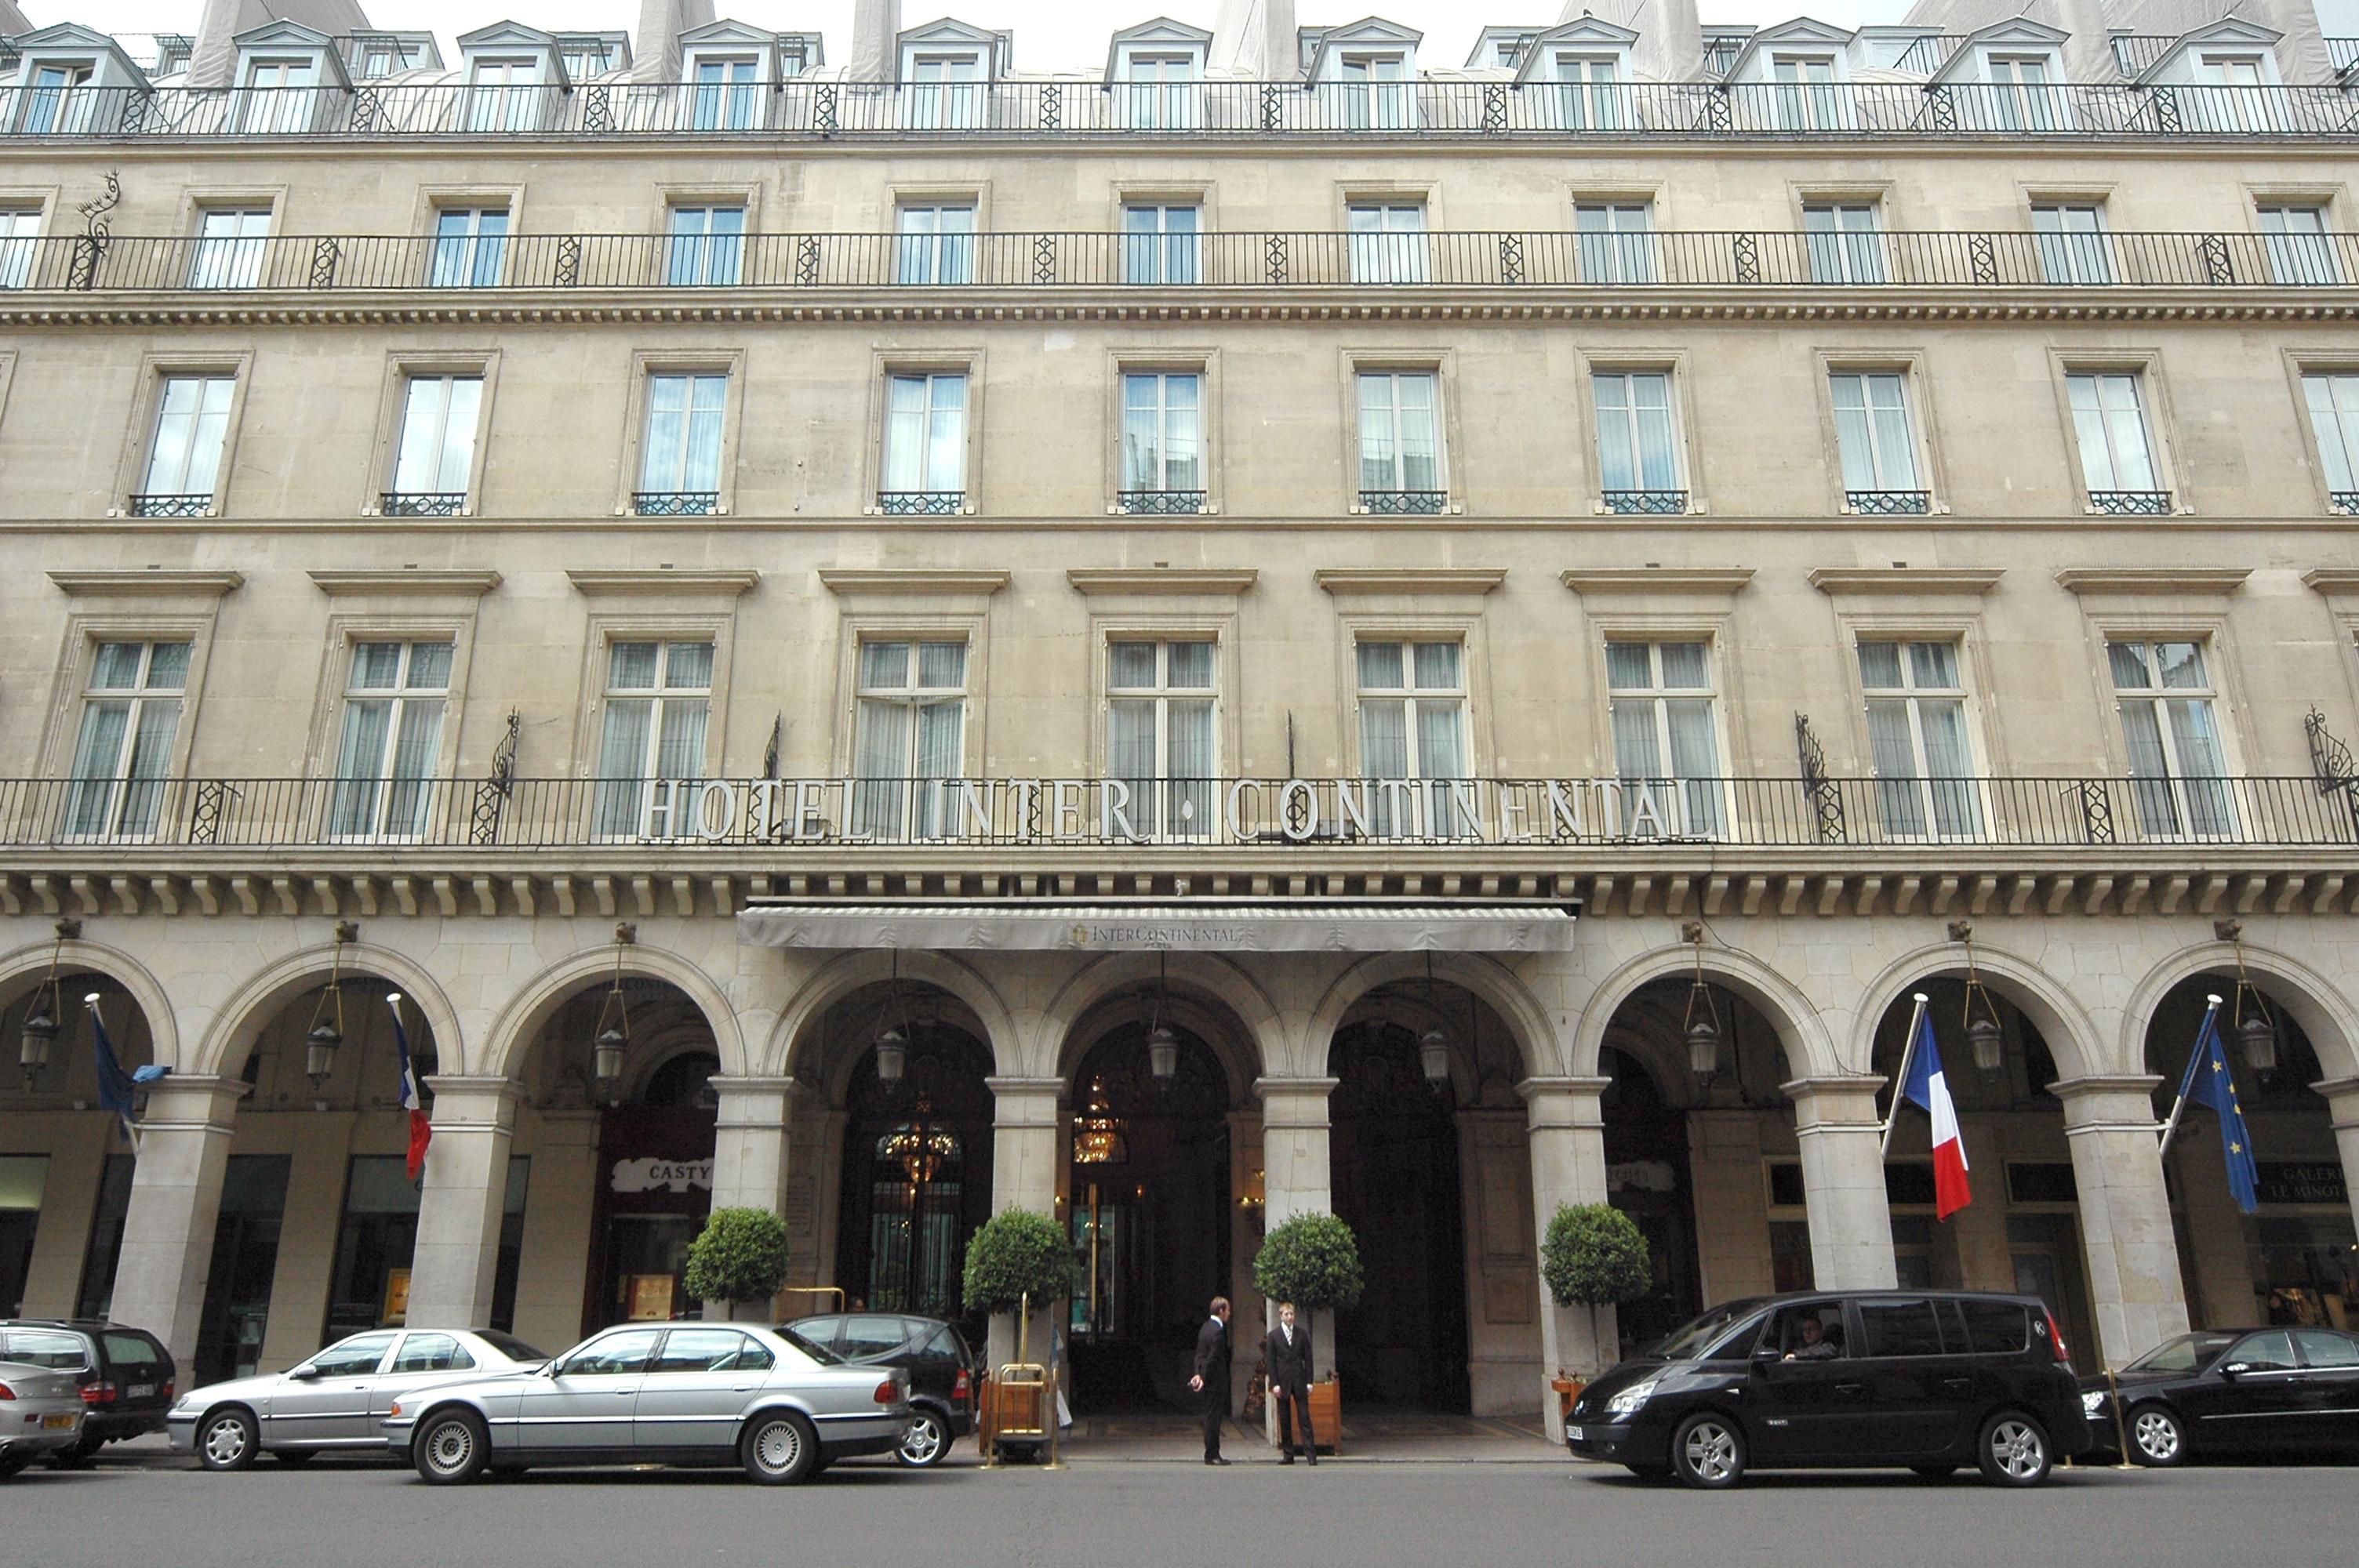 Hotel Carlton Paris Adrebe